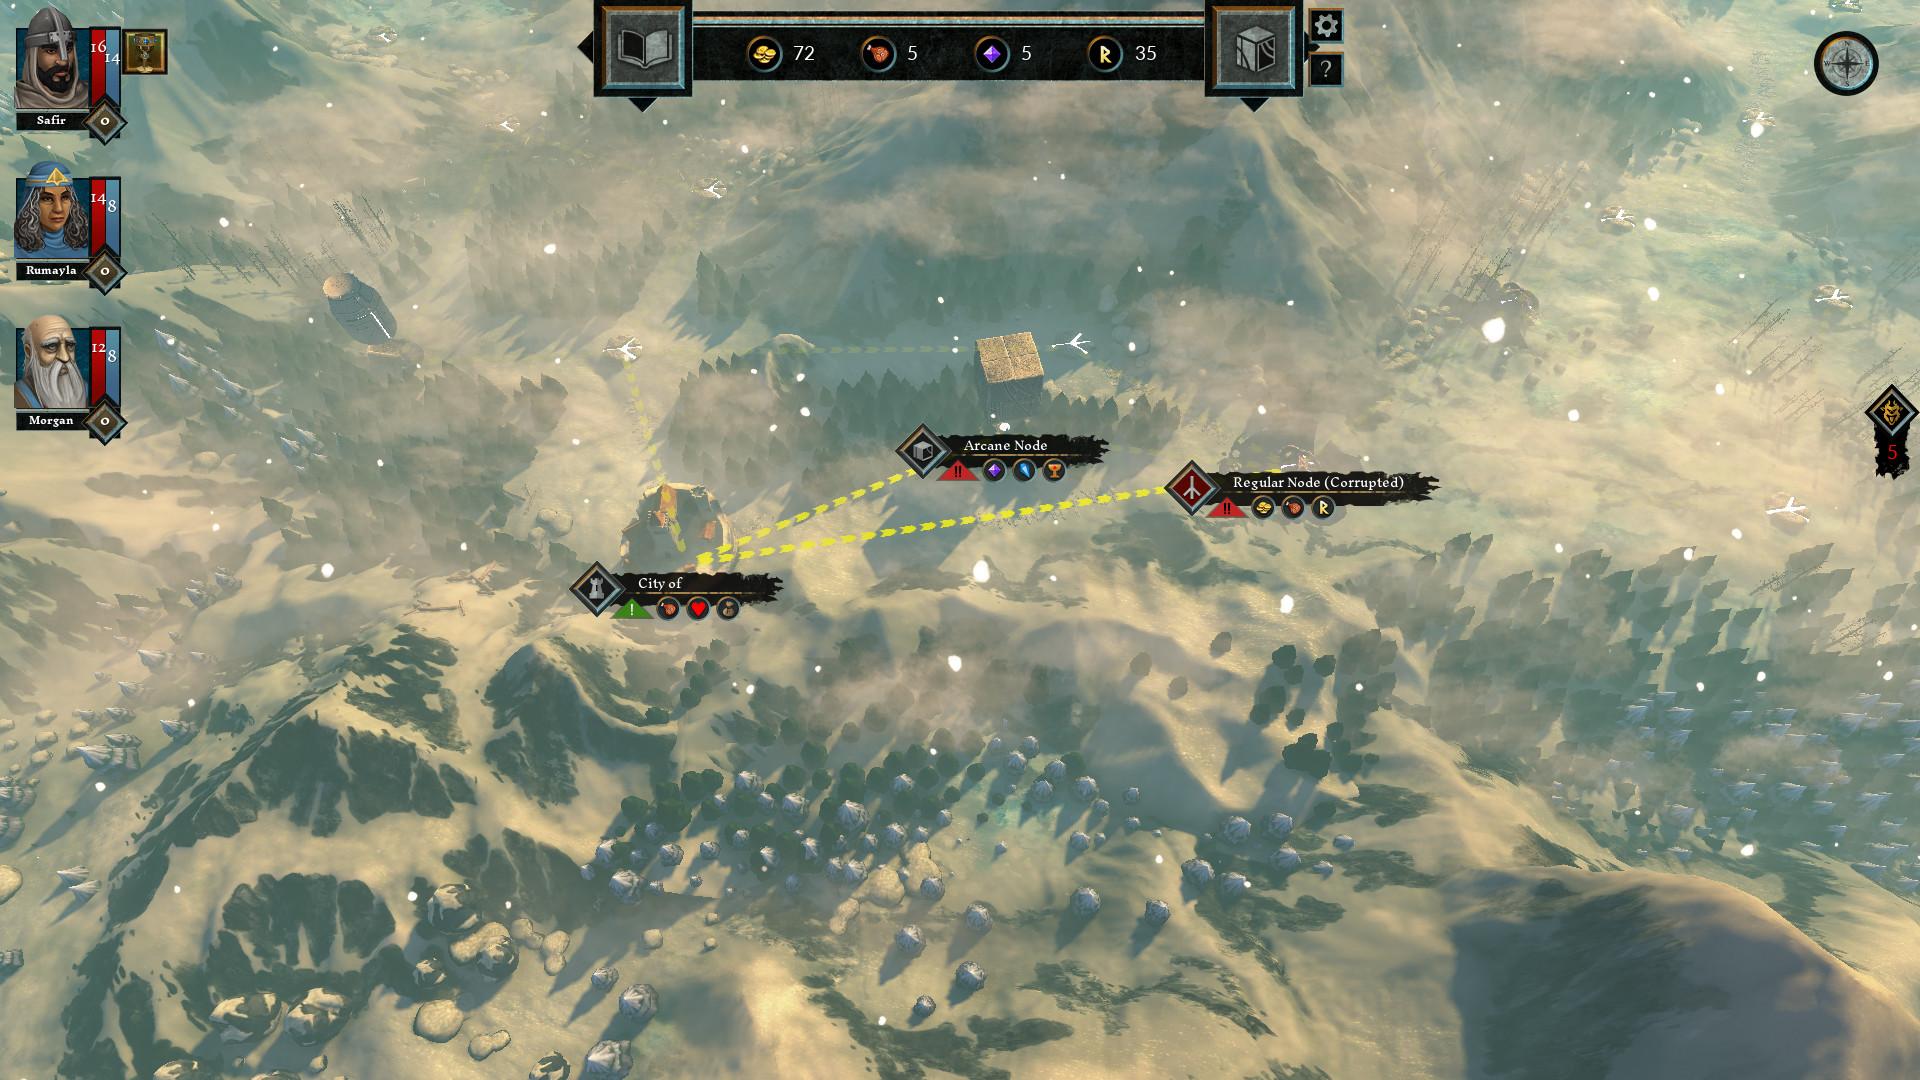 The Hand of Merlin screenshot 3